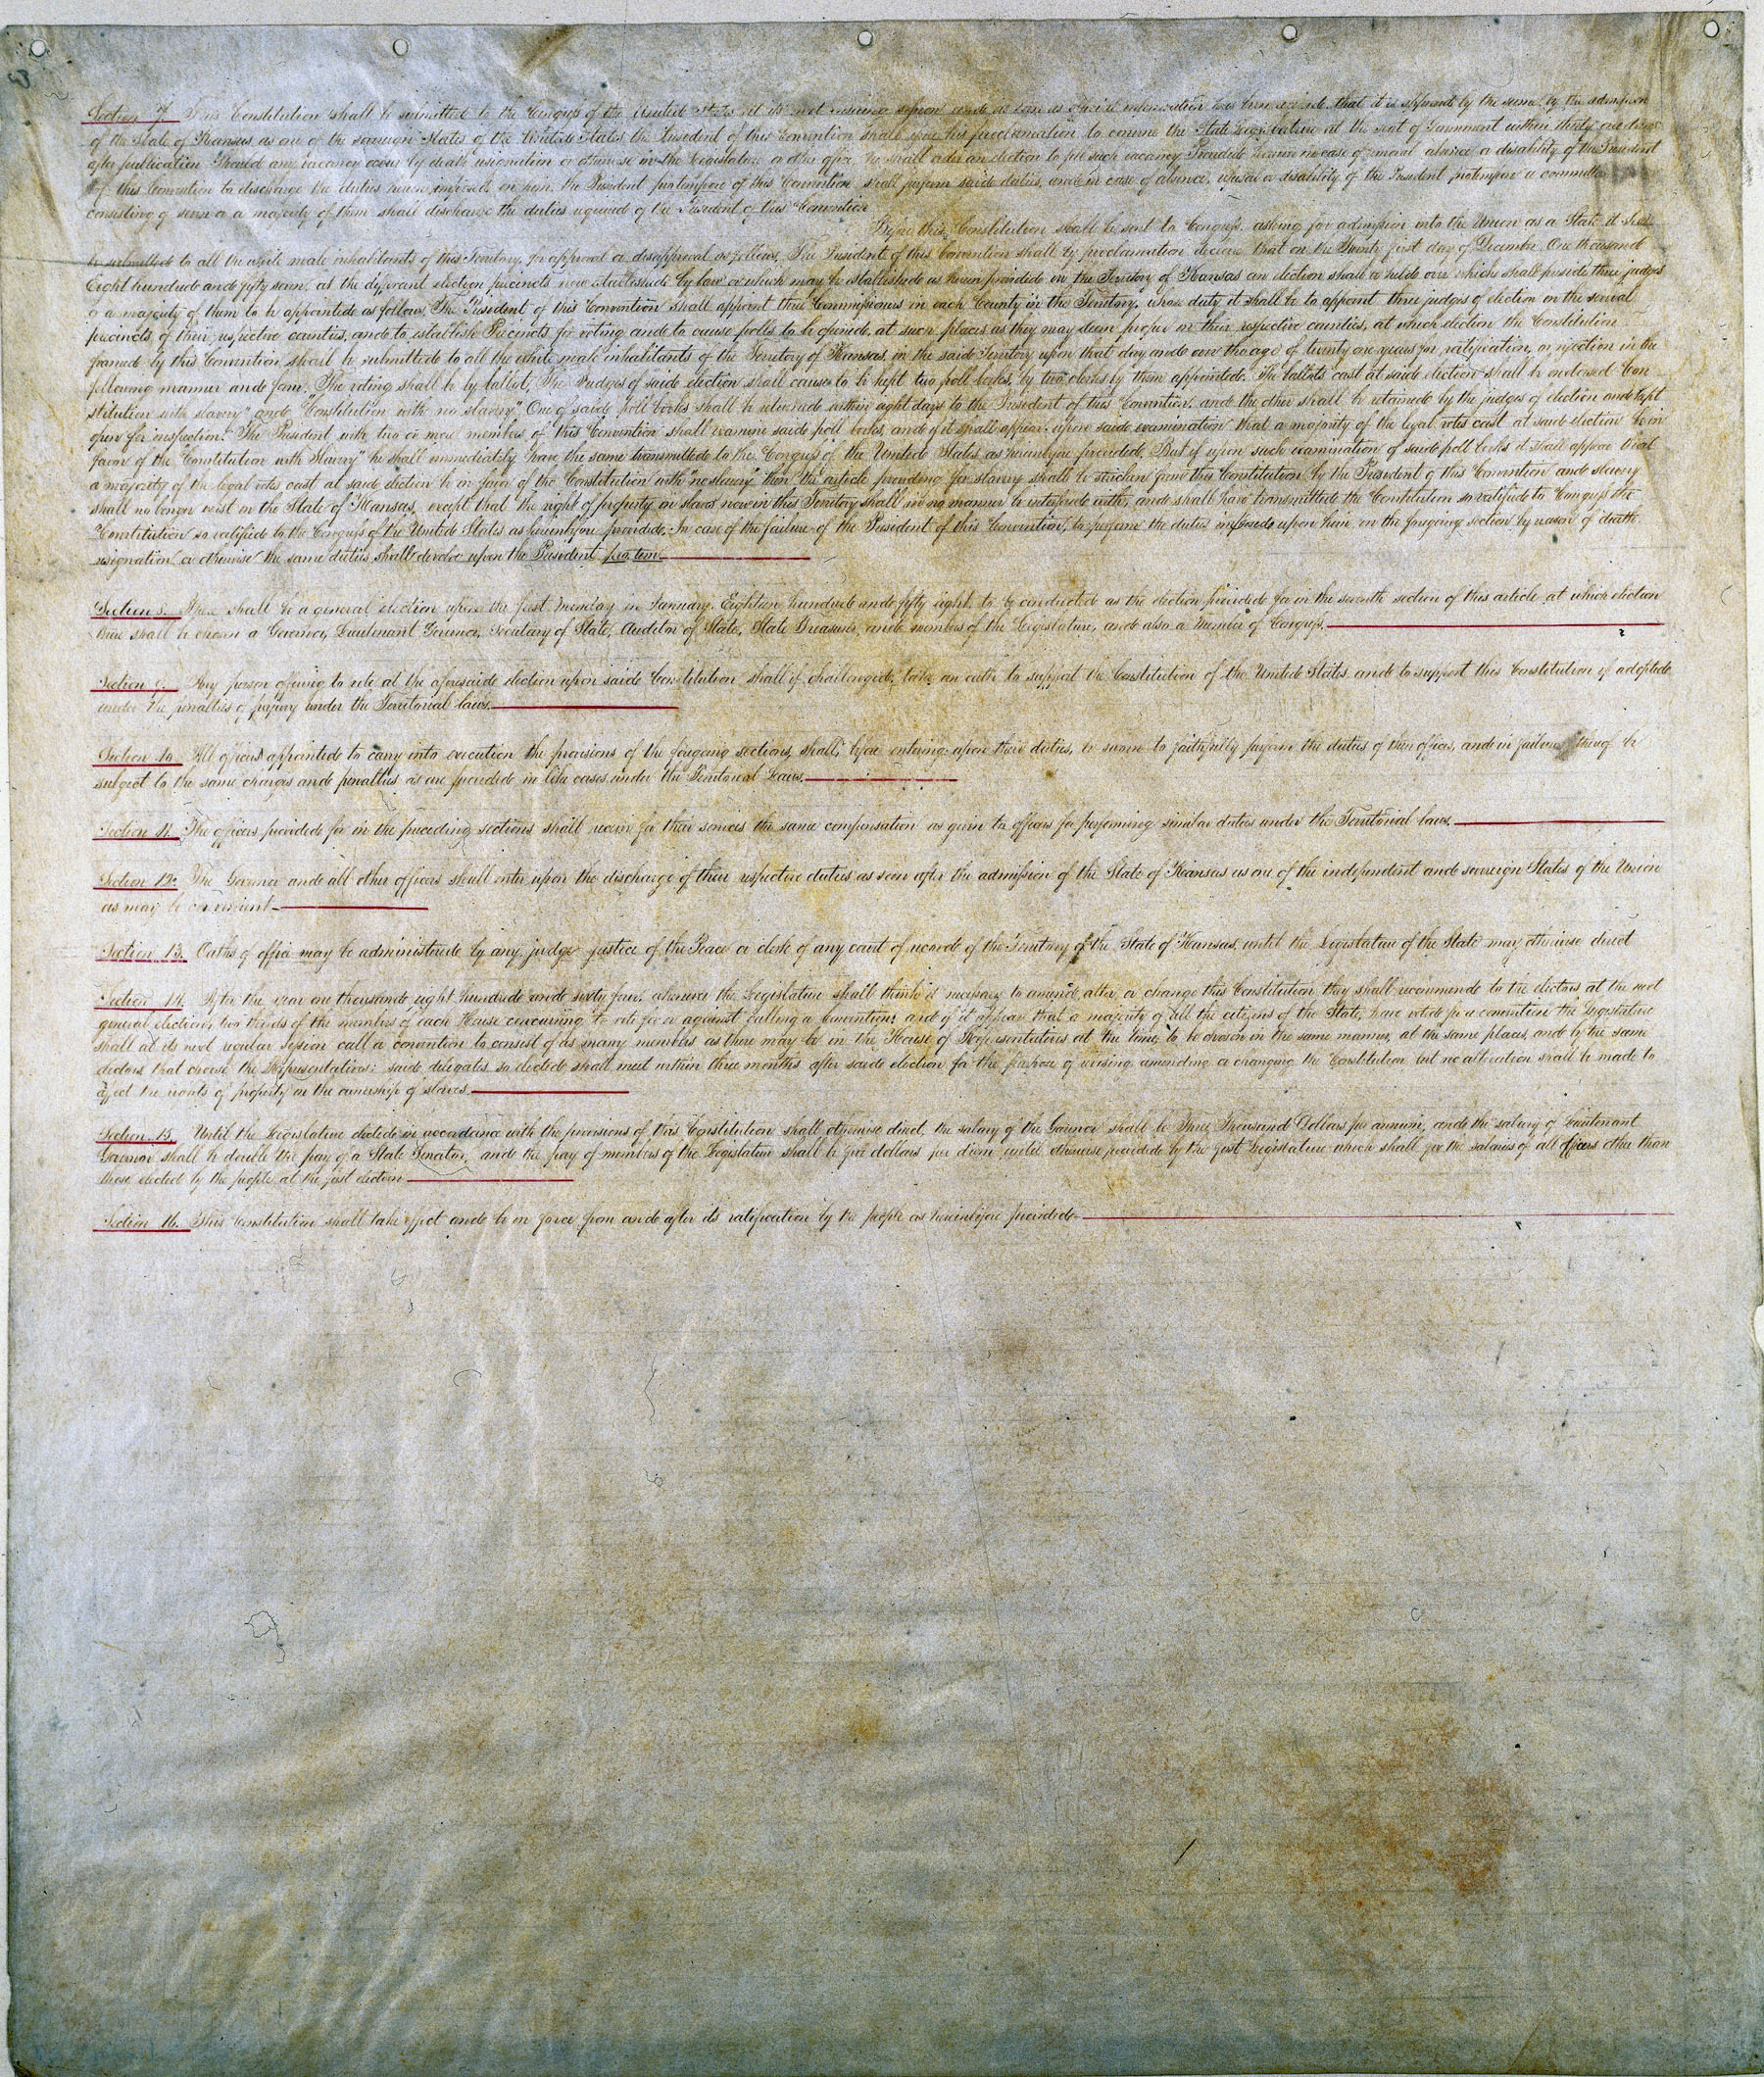 Lecompton Constitution - 7